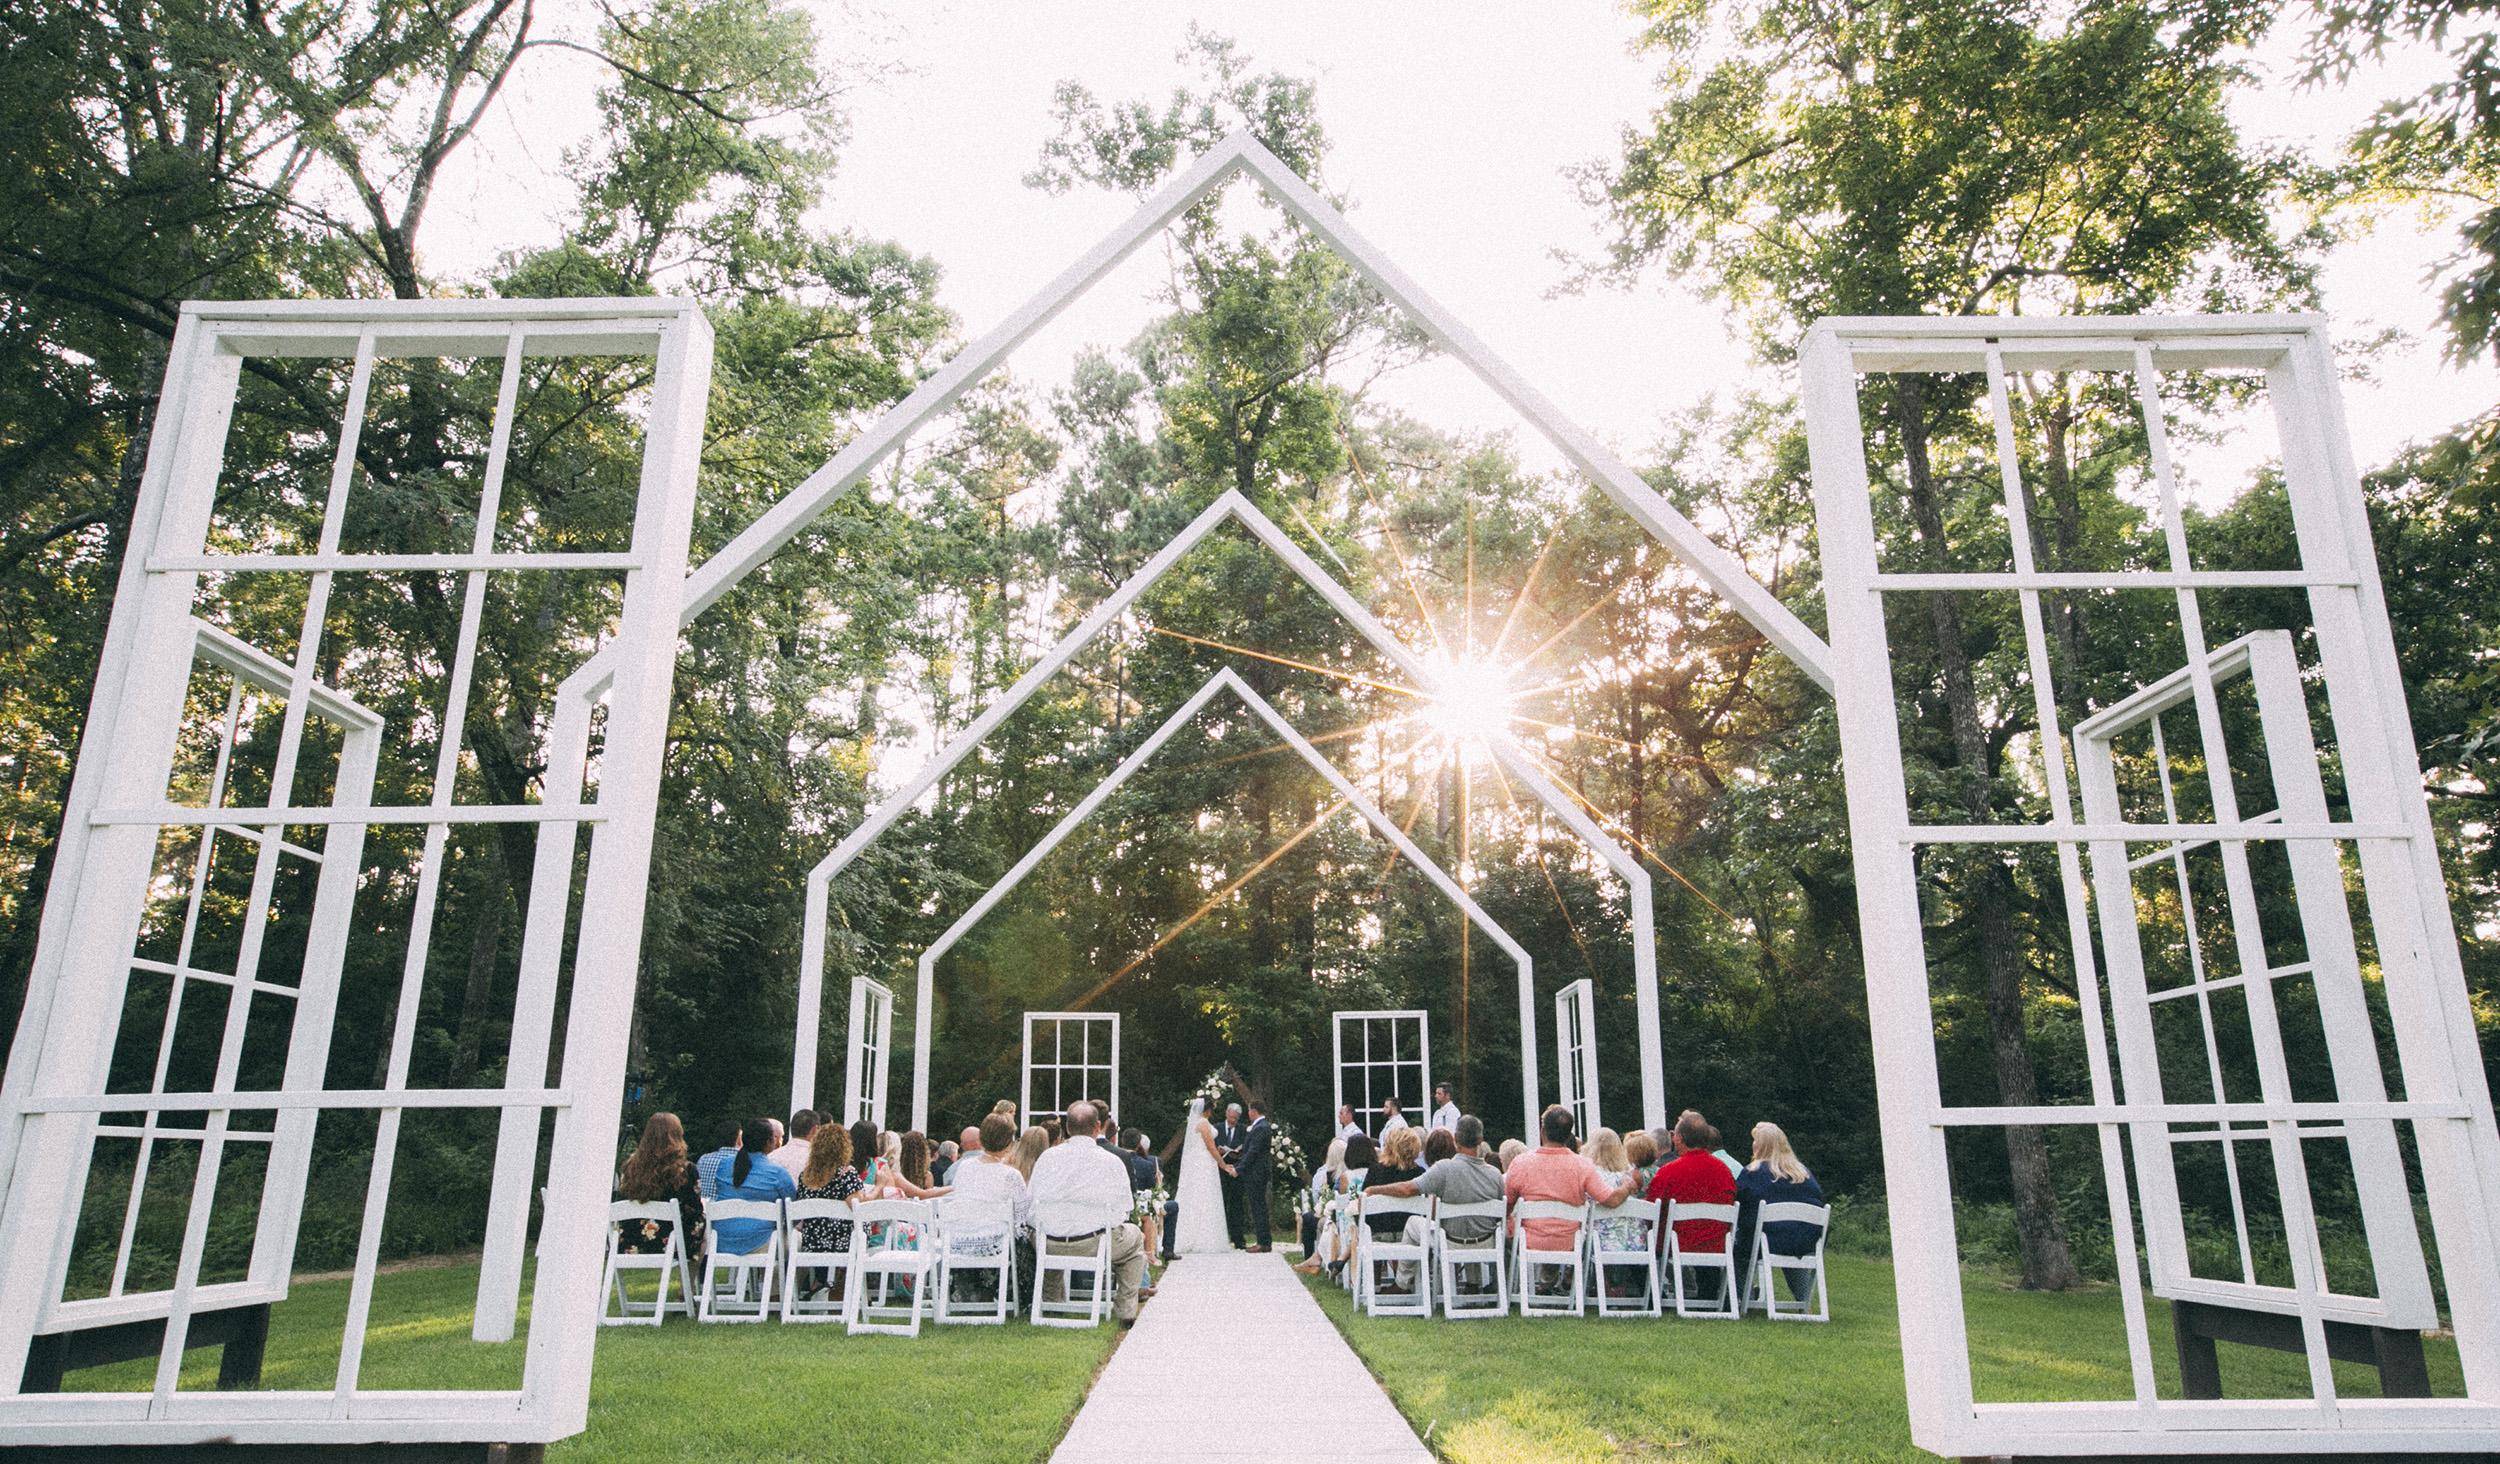 meekermark houston wedding venue